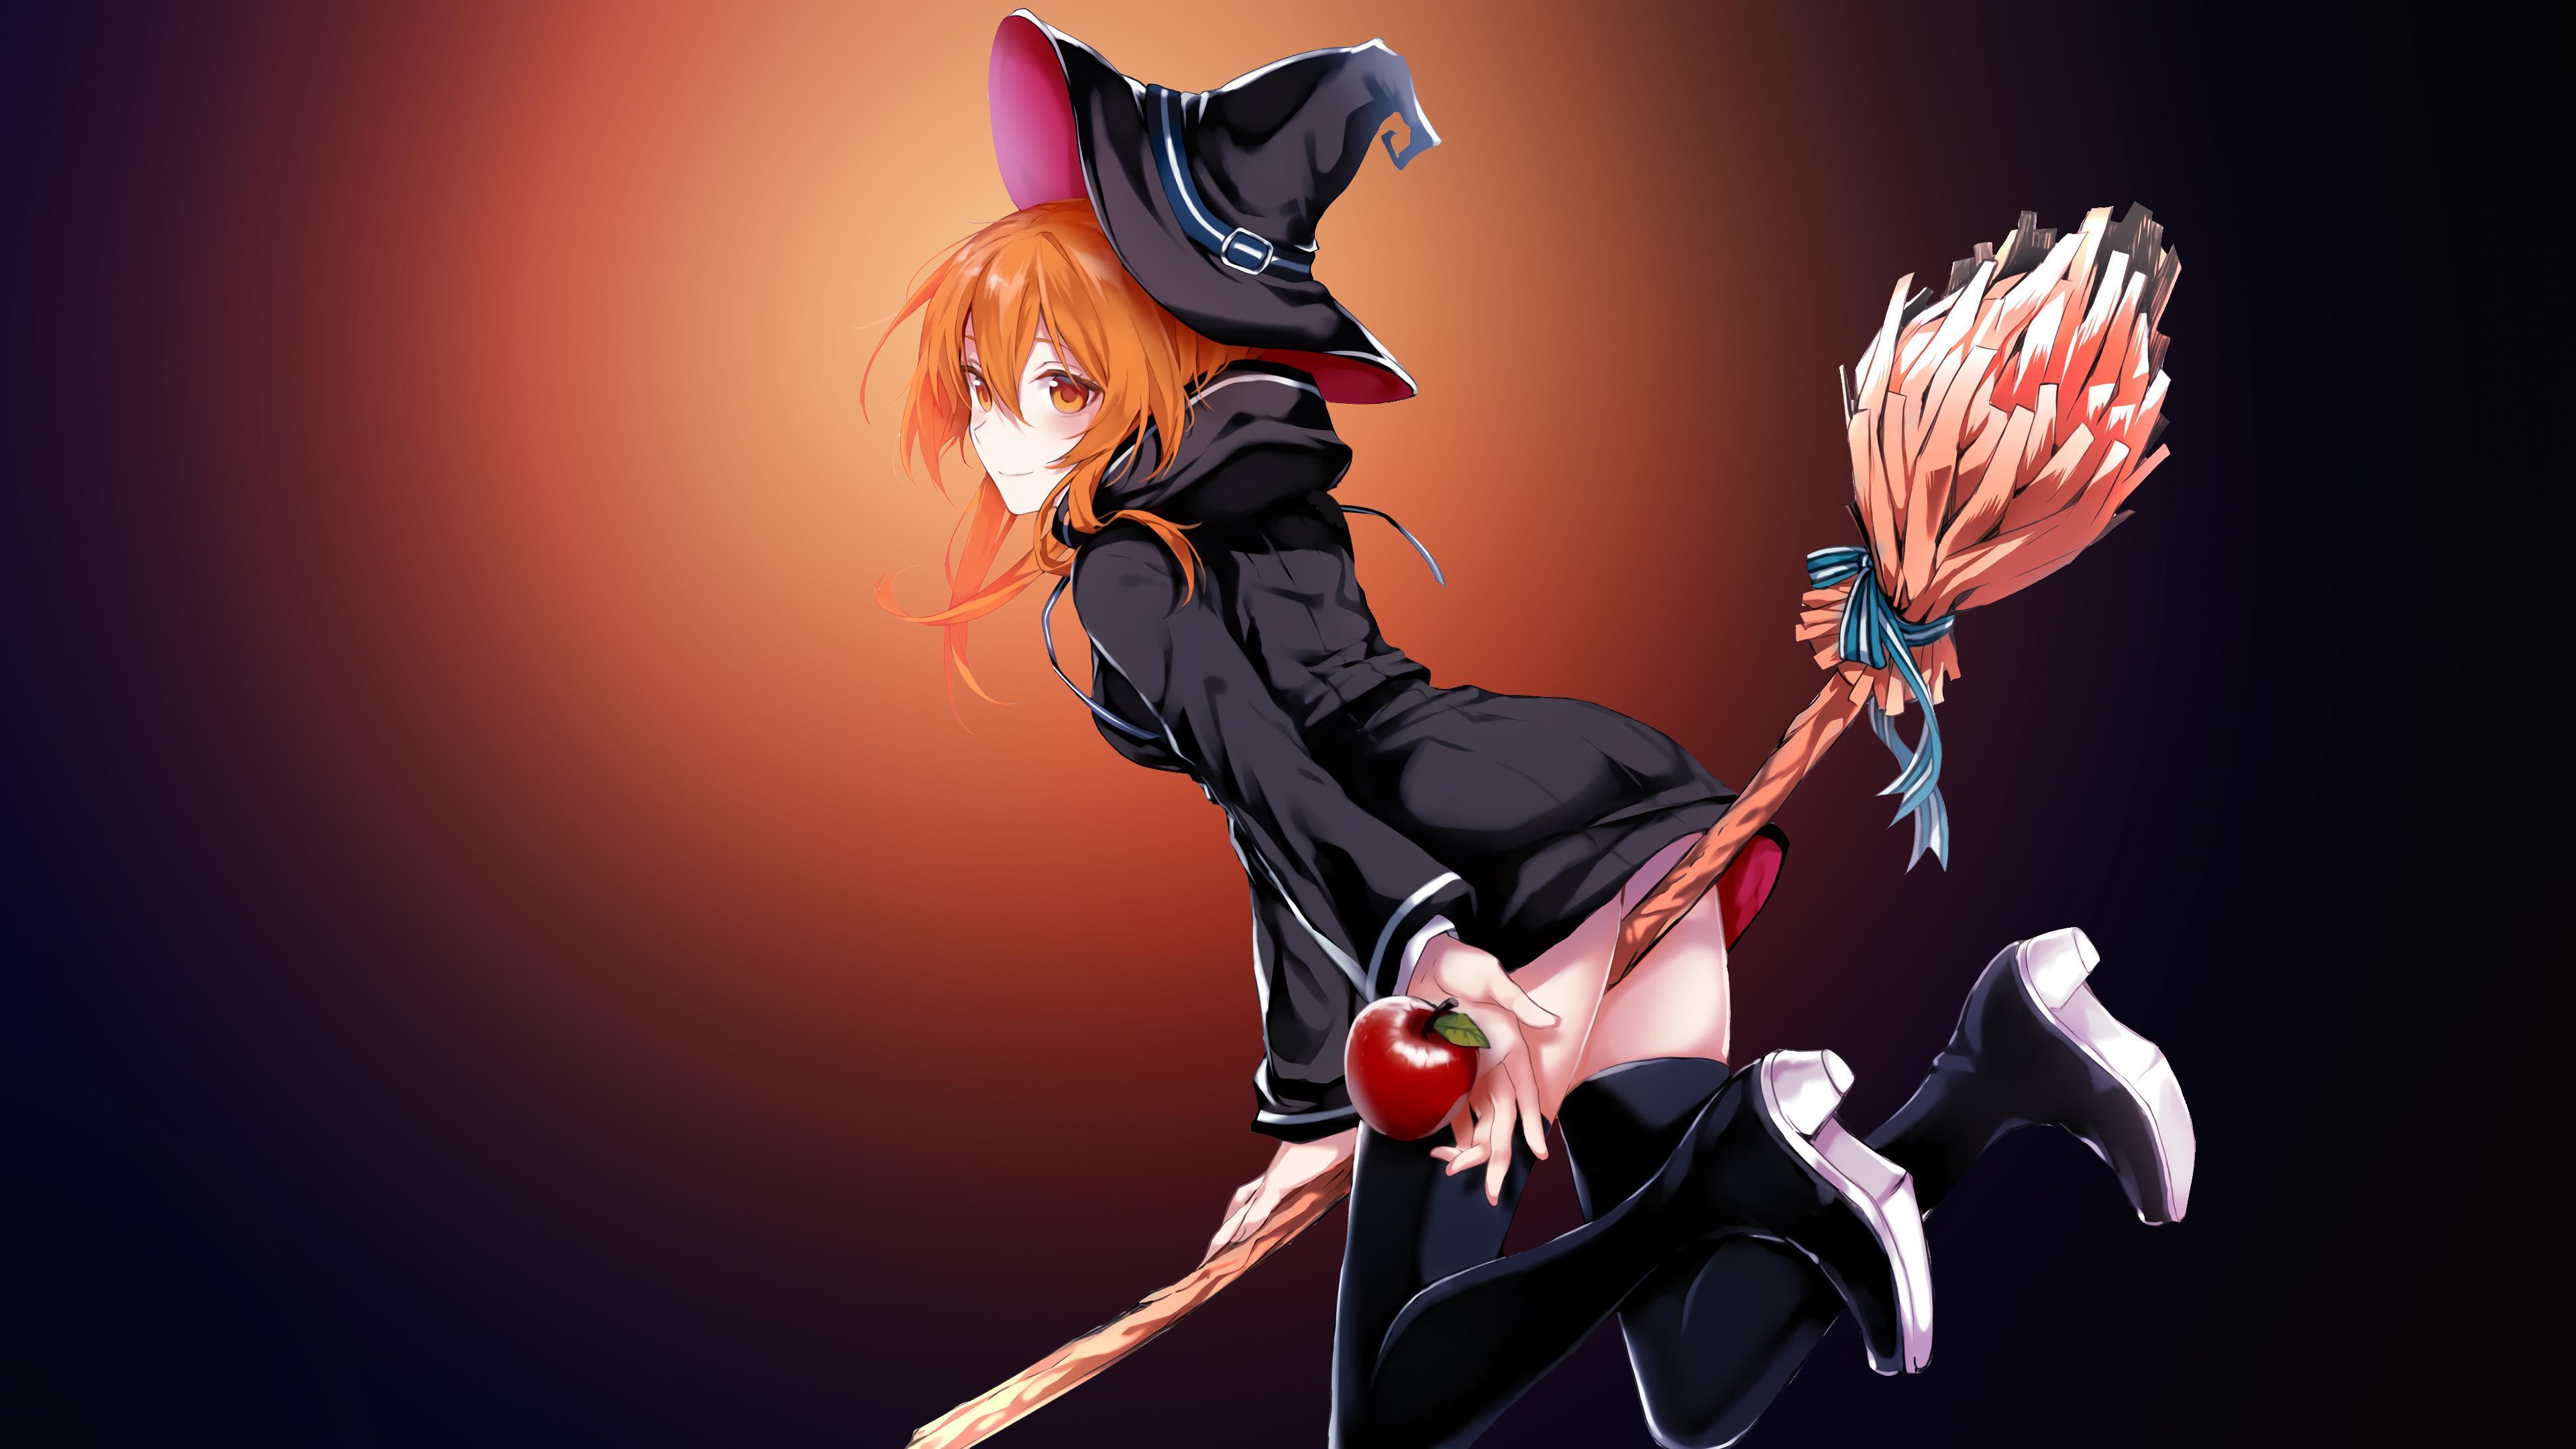 Wallpapers Magic girl, Halloween costume, Flying broomstick